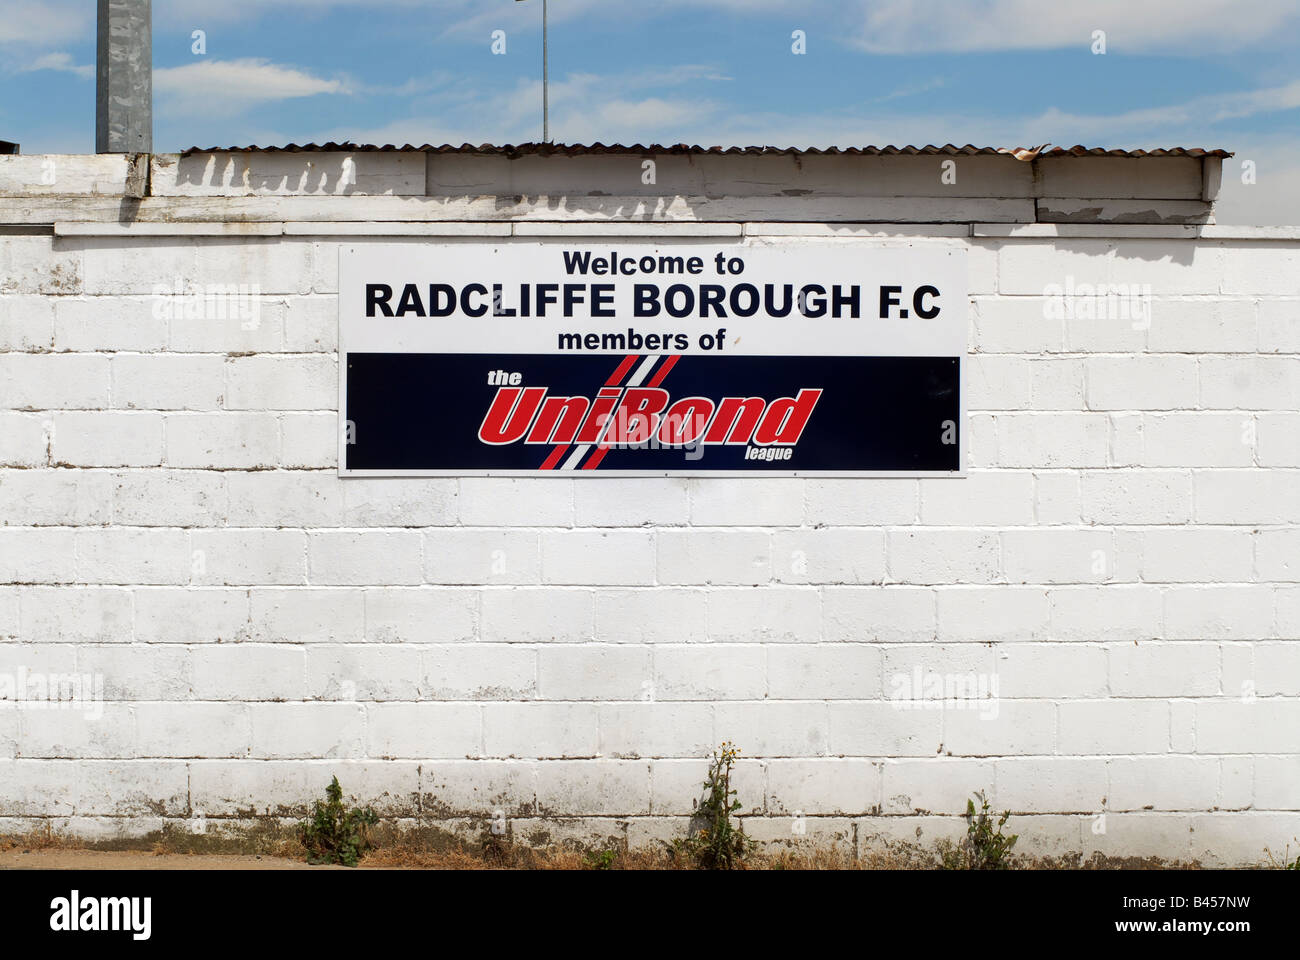 Radcliffe Borough Football Club F.C - Stock Image